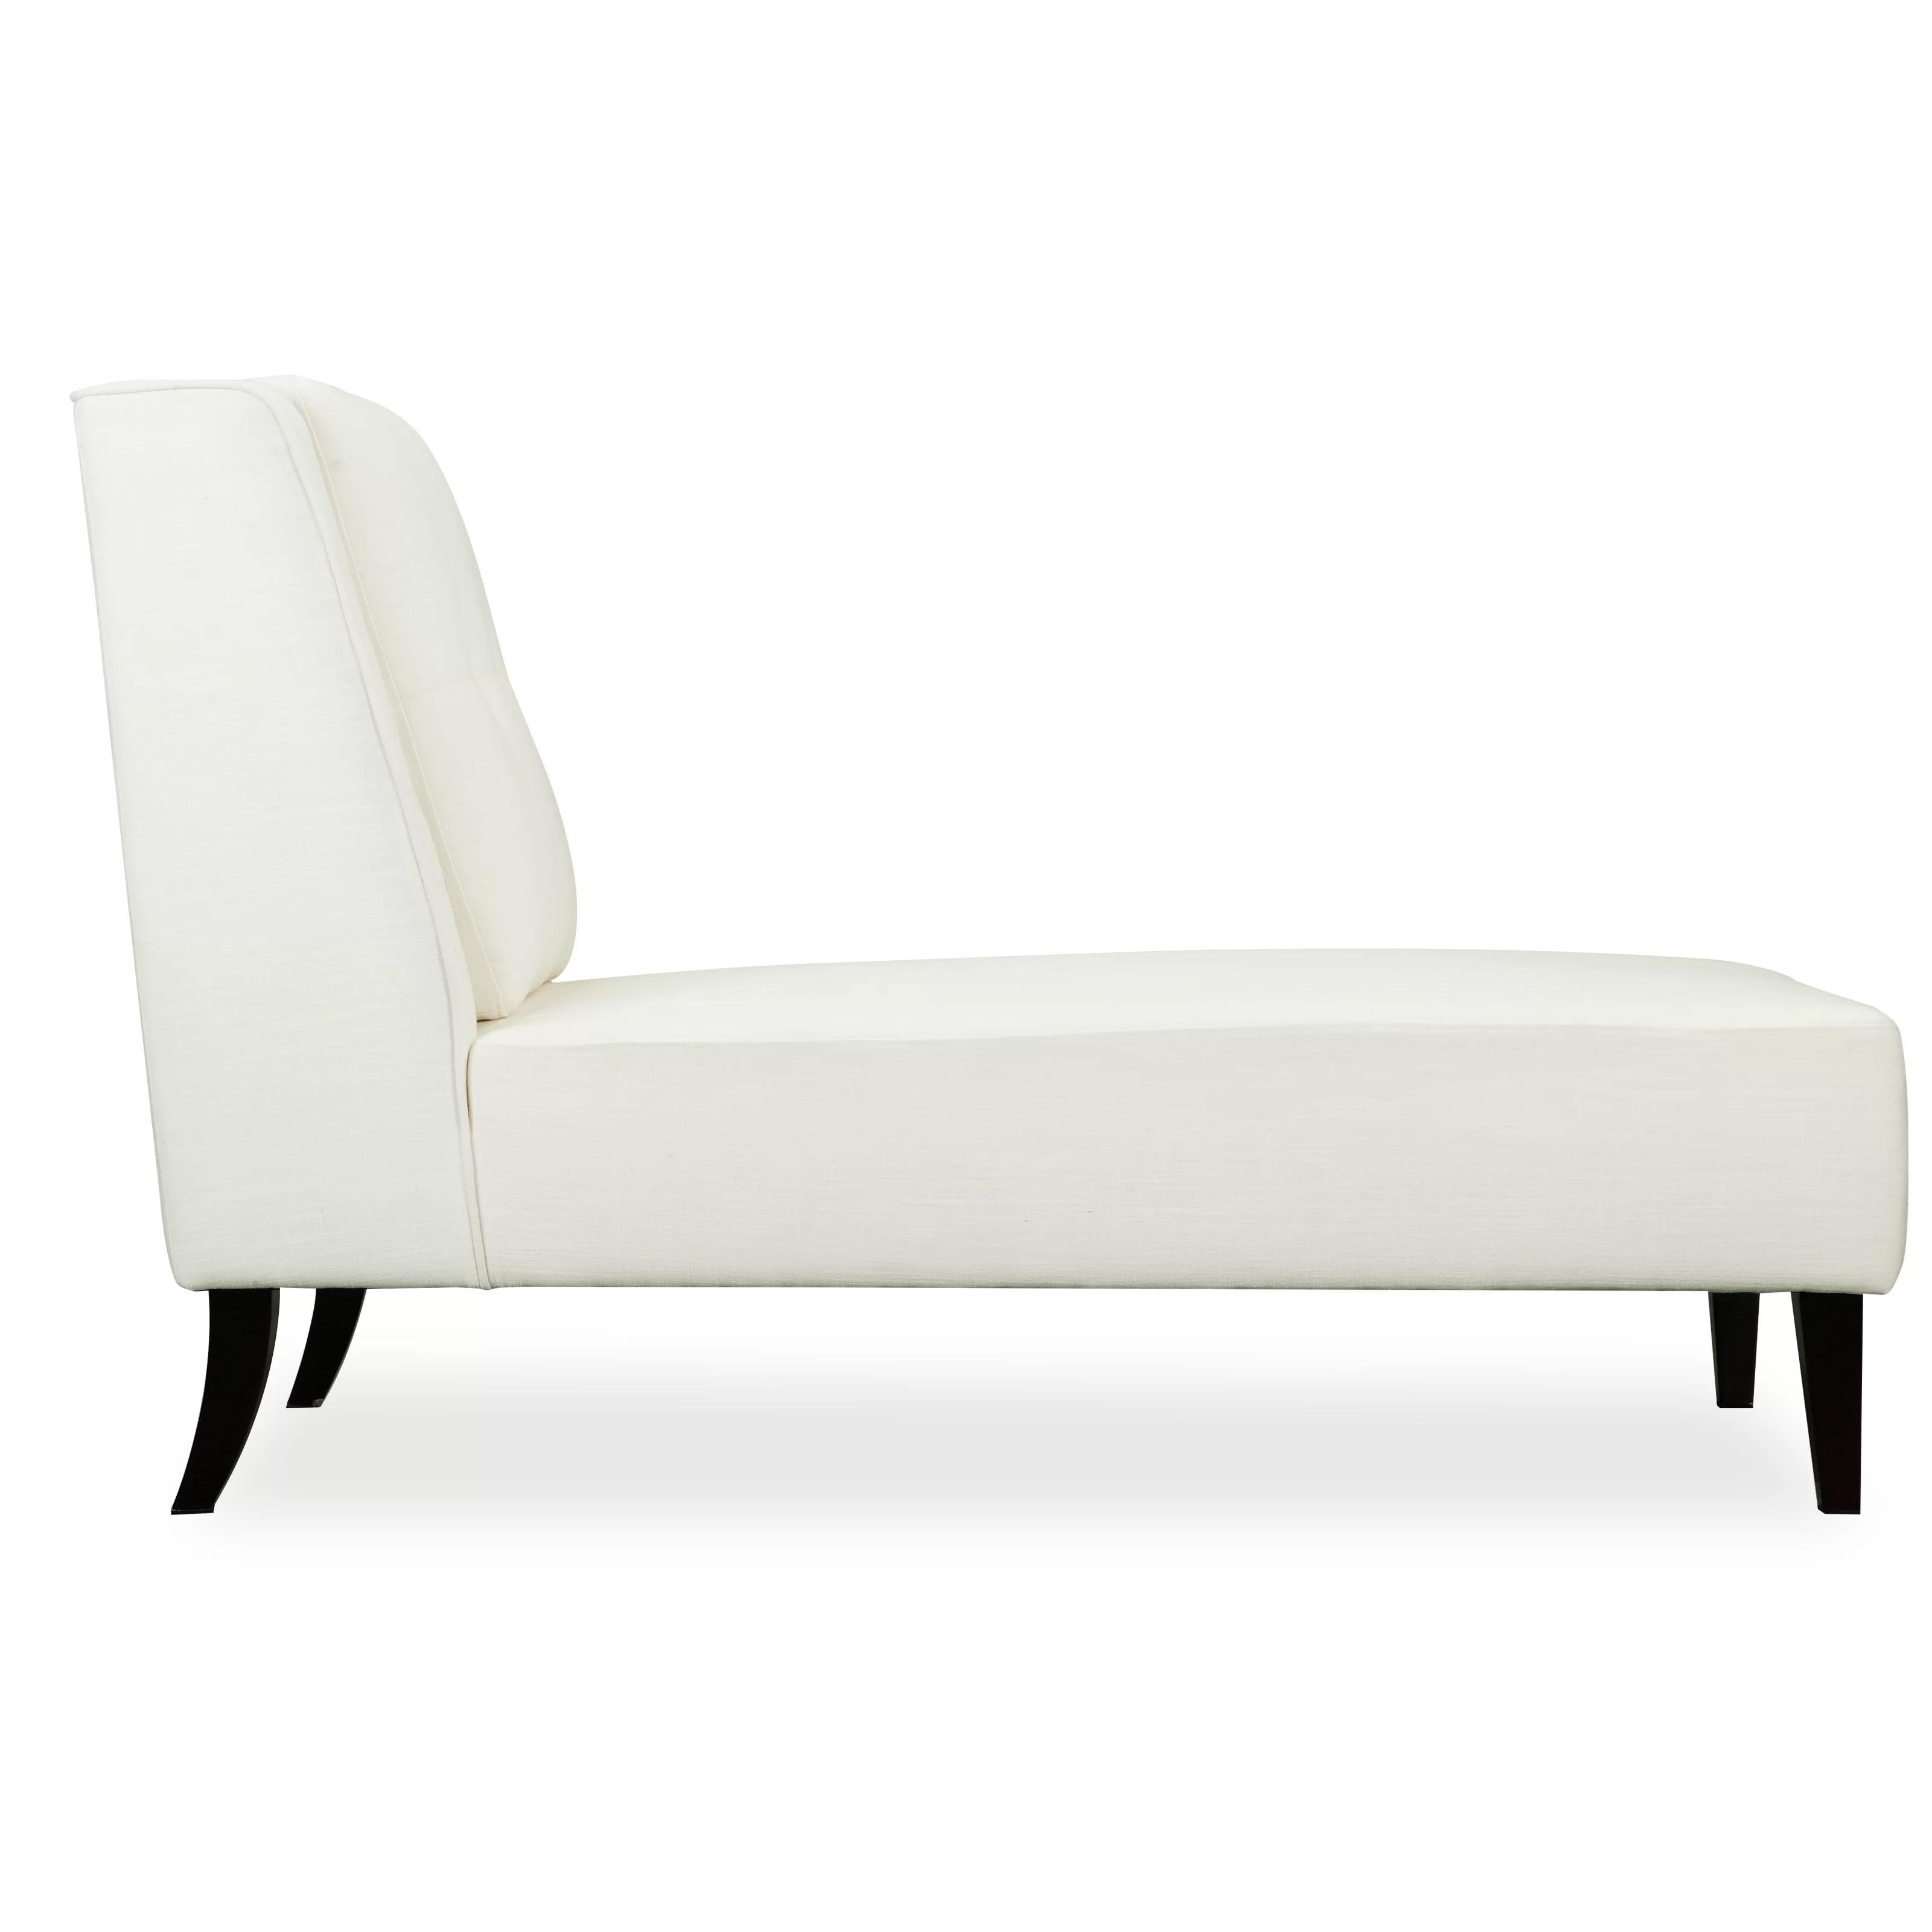 studio sofas chaises jong psv helmond sport sofascore brayden acubens chaise lounge wayfair